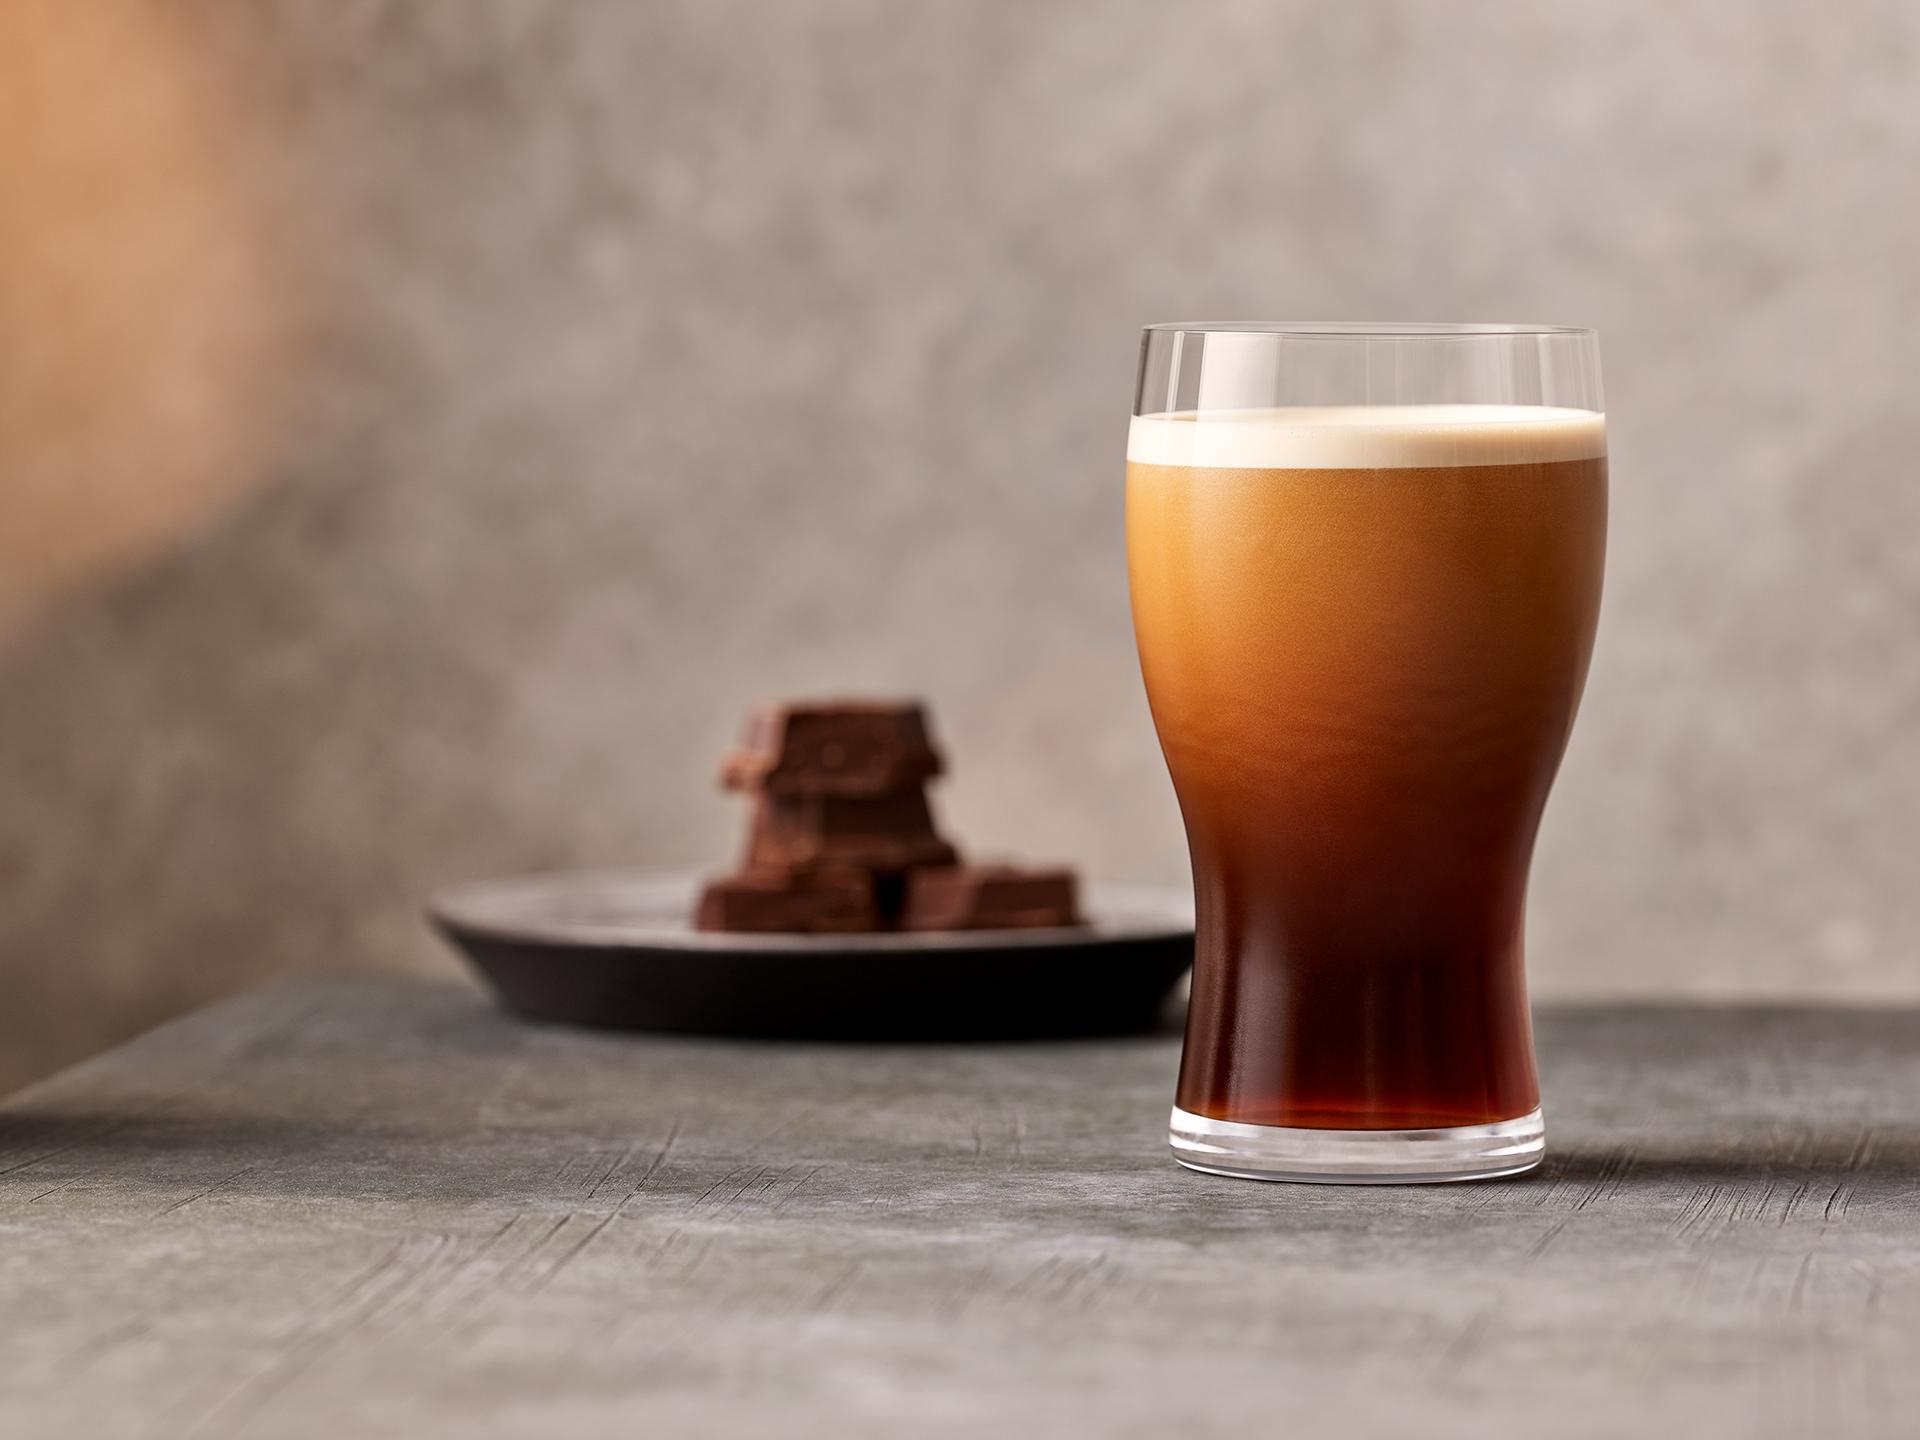 nitro-coffee-still-glas-siemens